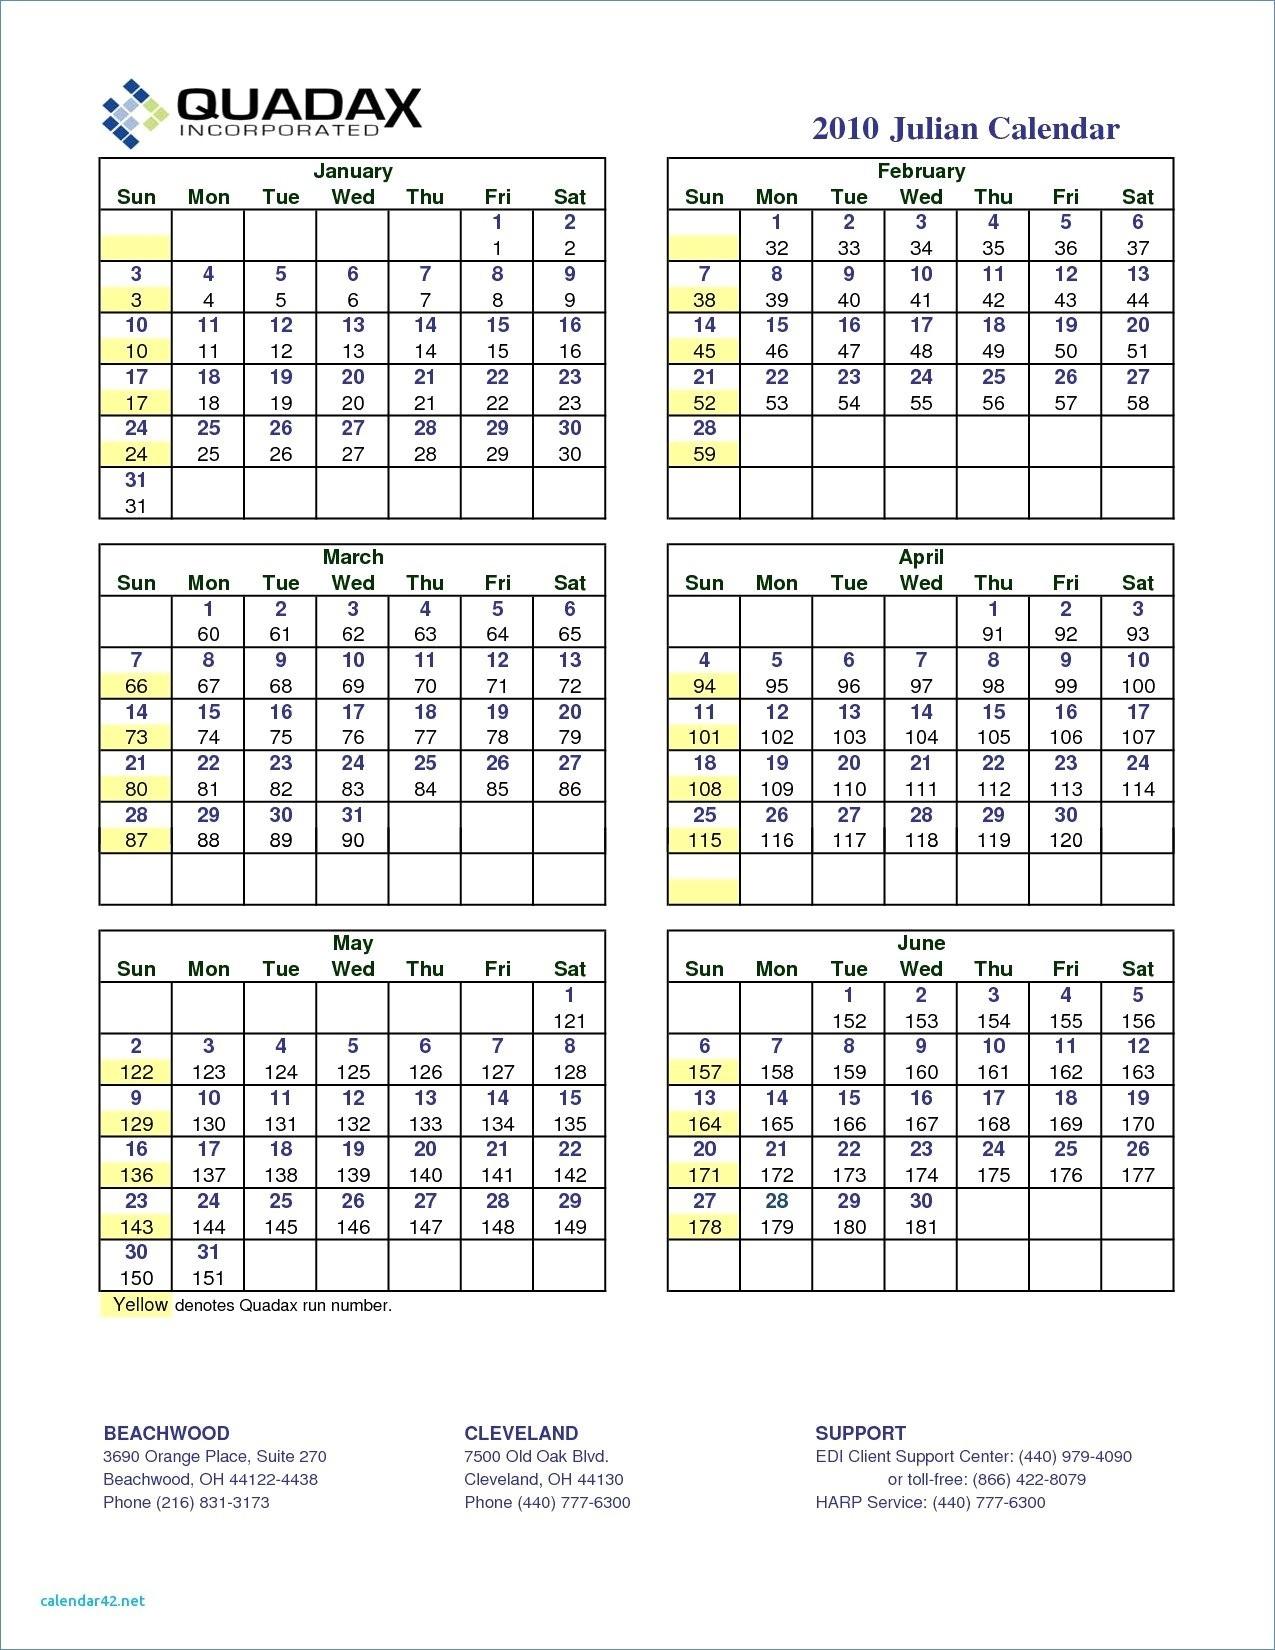 Quadax Julian Calendar 2020 Pdf | Example Calendar Printable inside Julian Calendar Quadax 2020